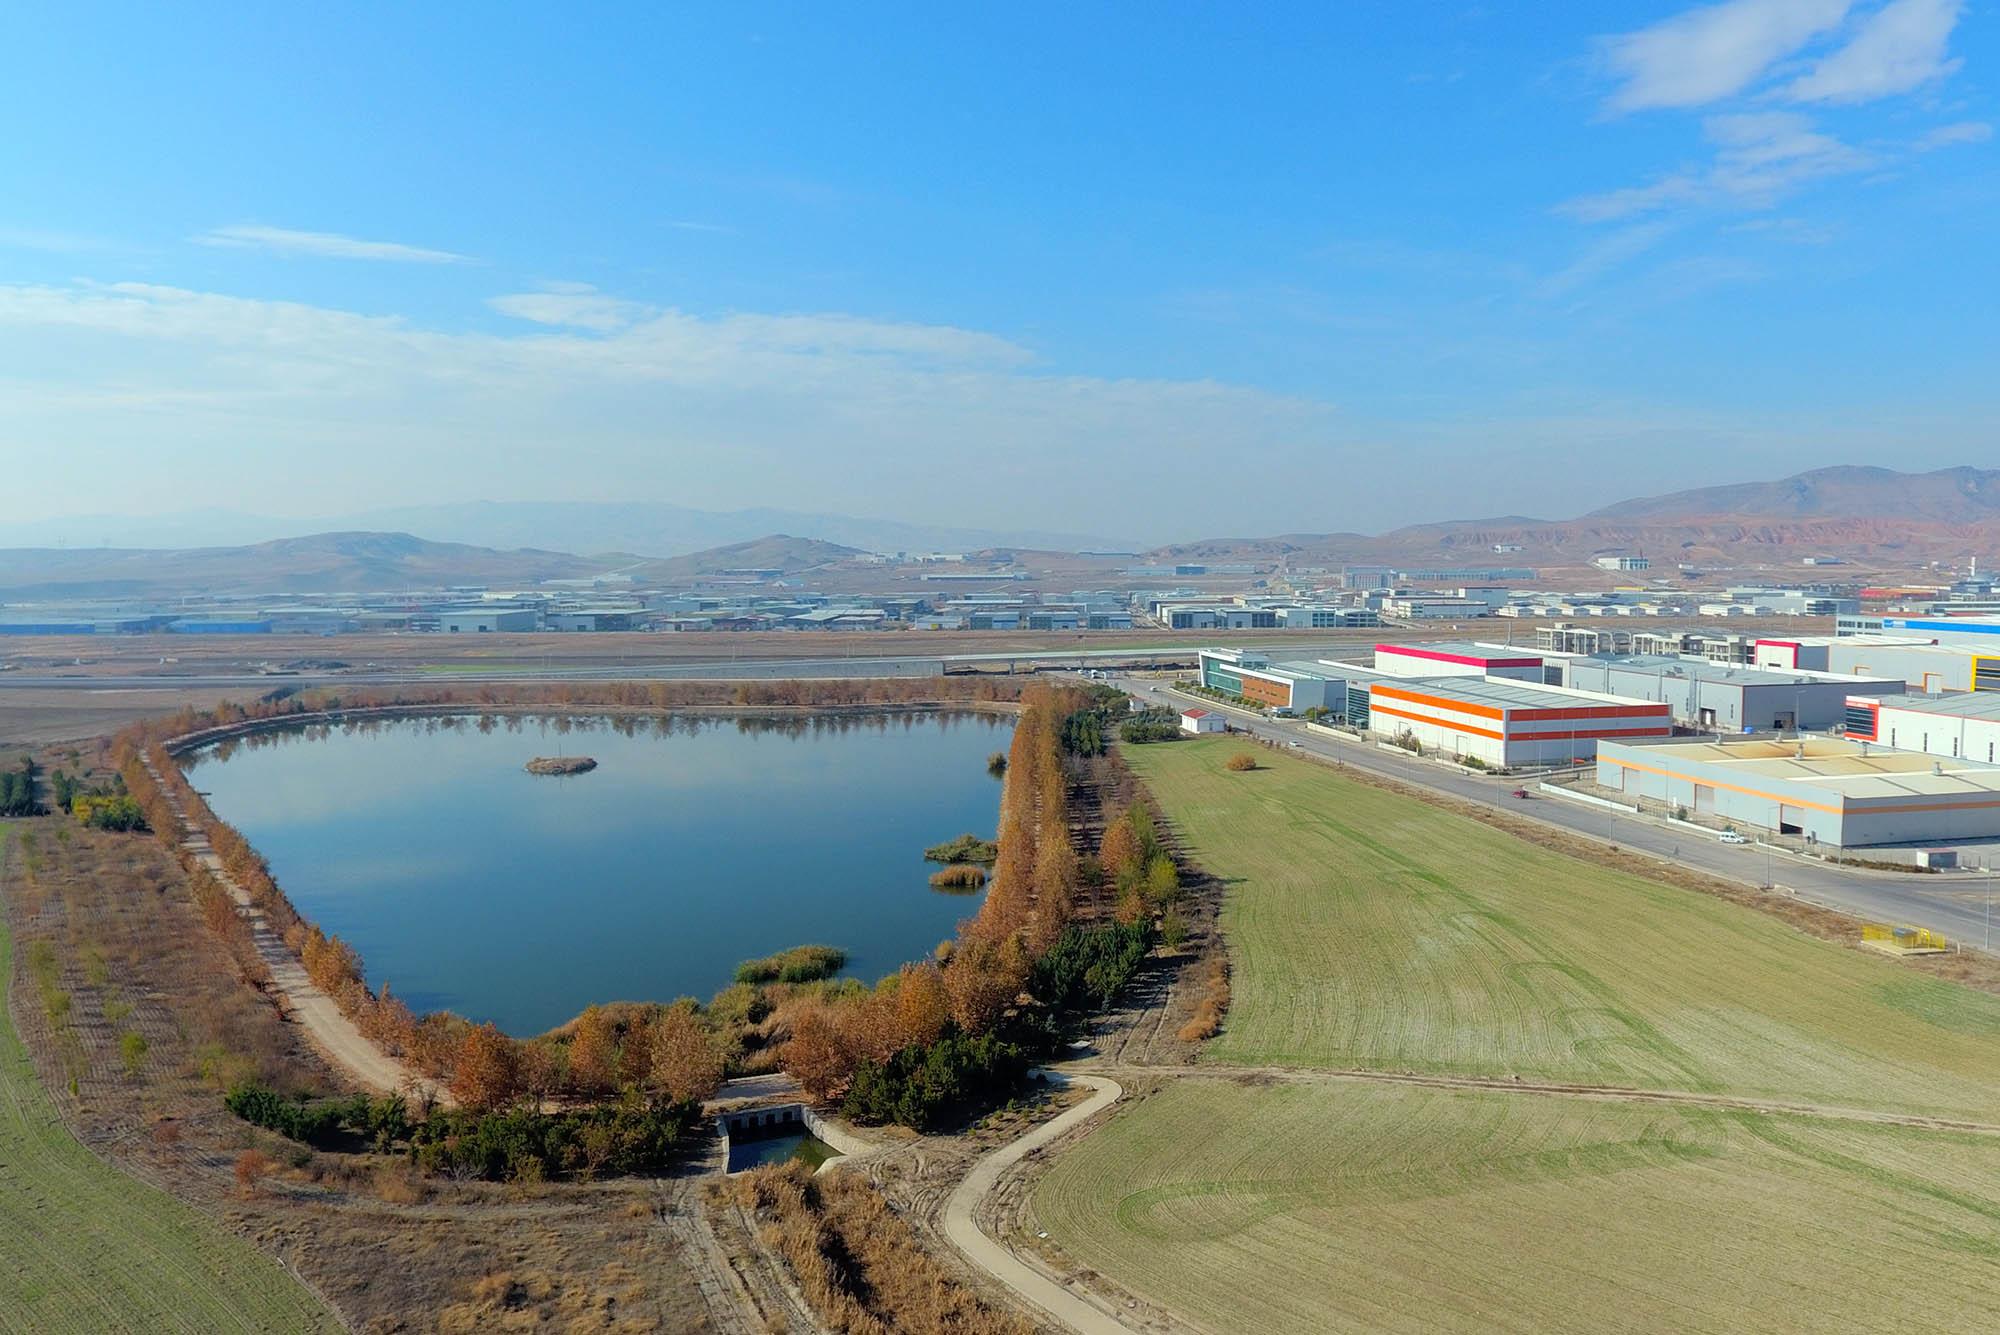 Anadolu Organize Sanayi Bölgesi Malıköy